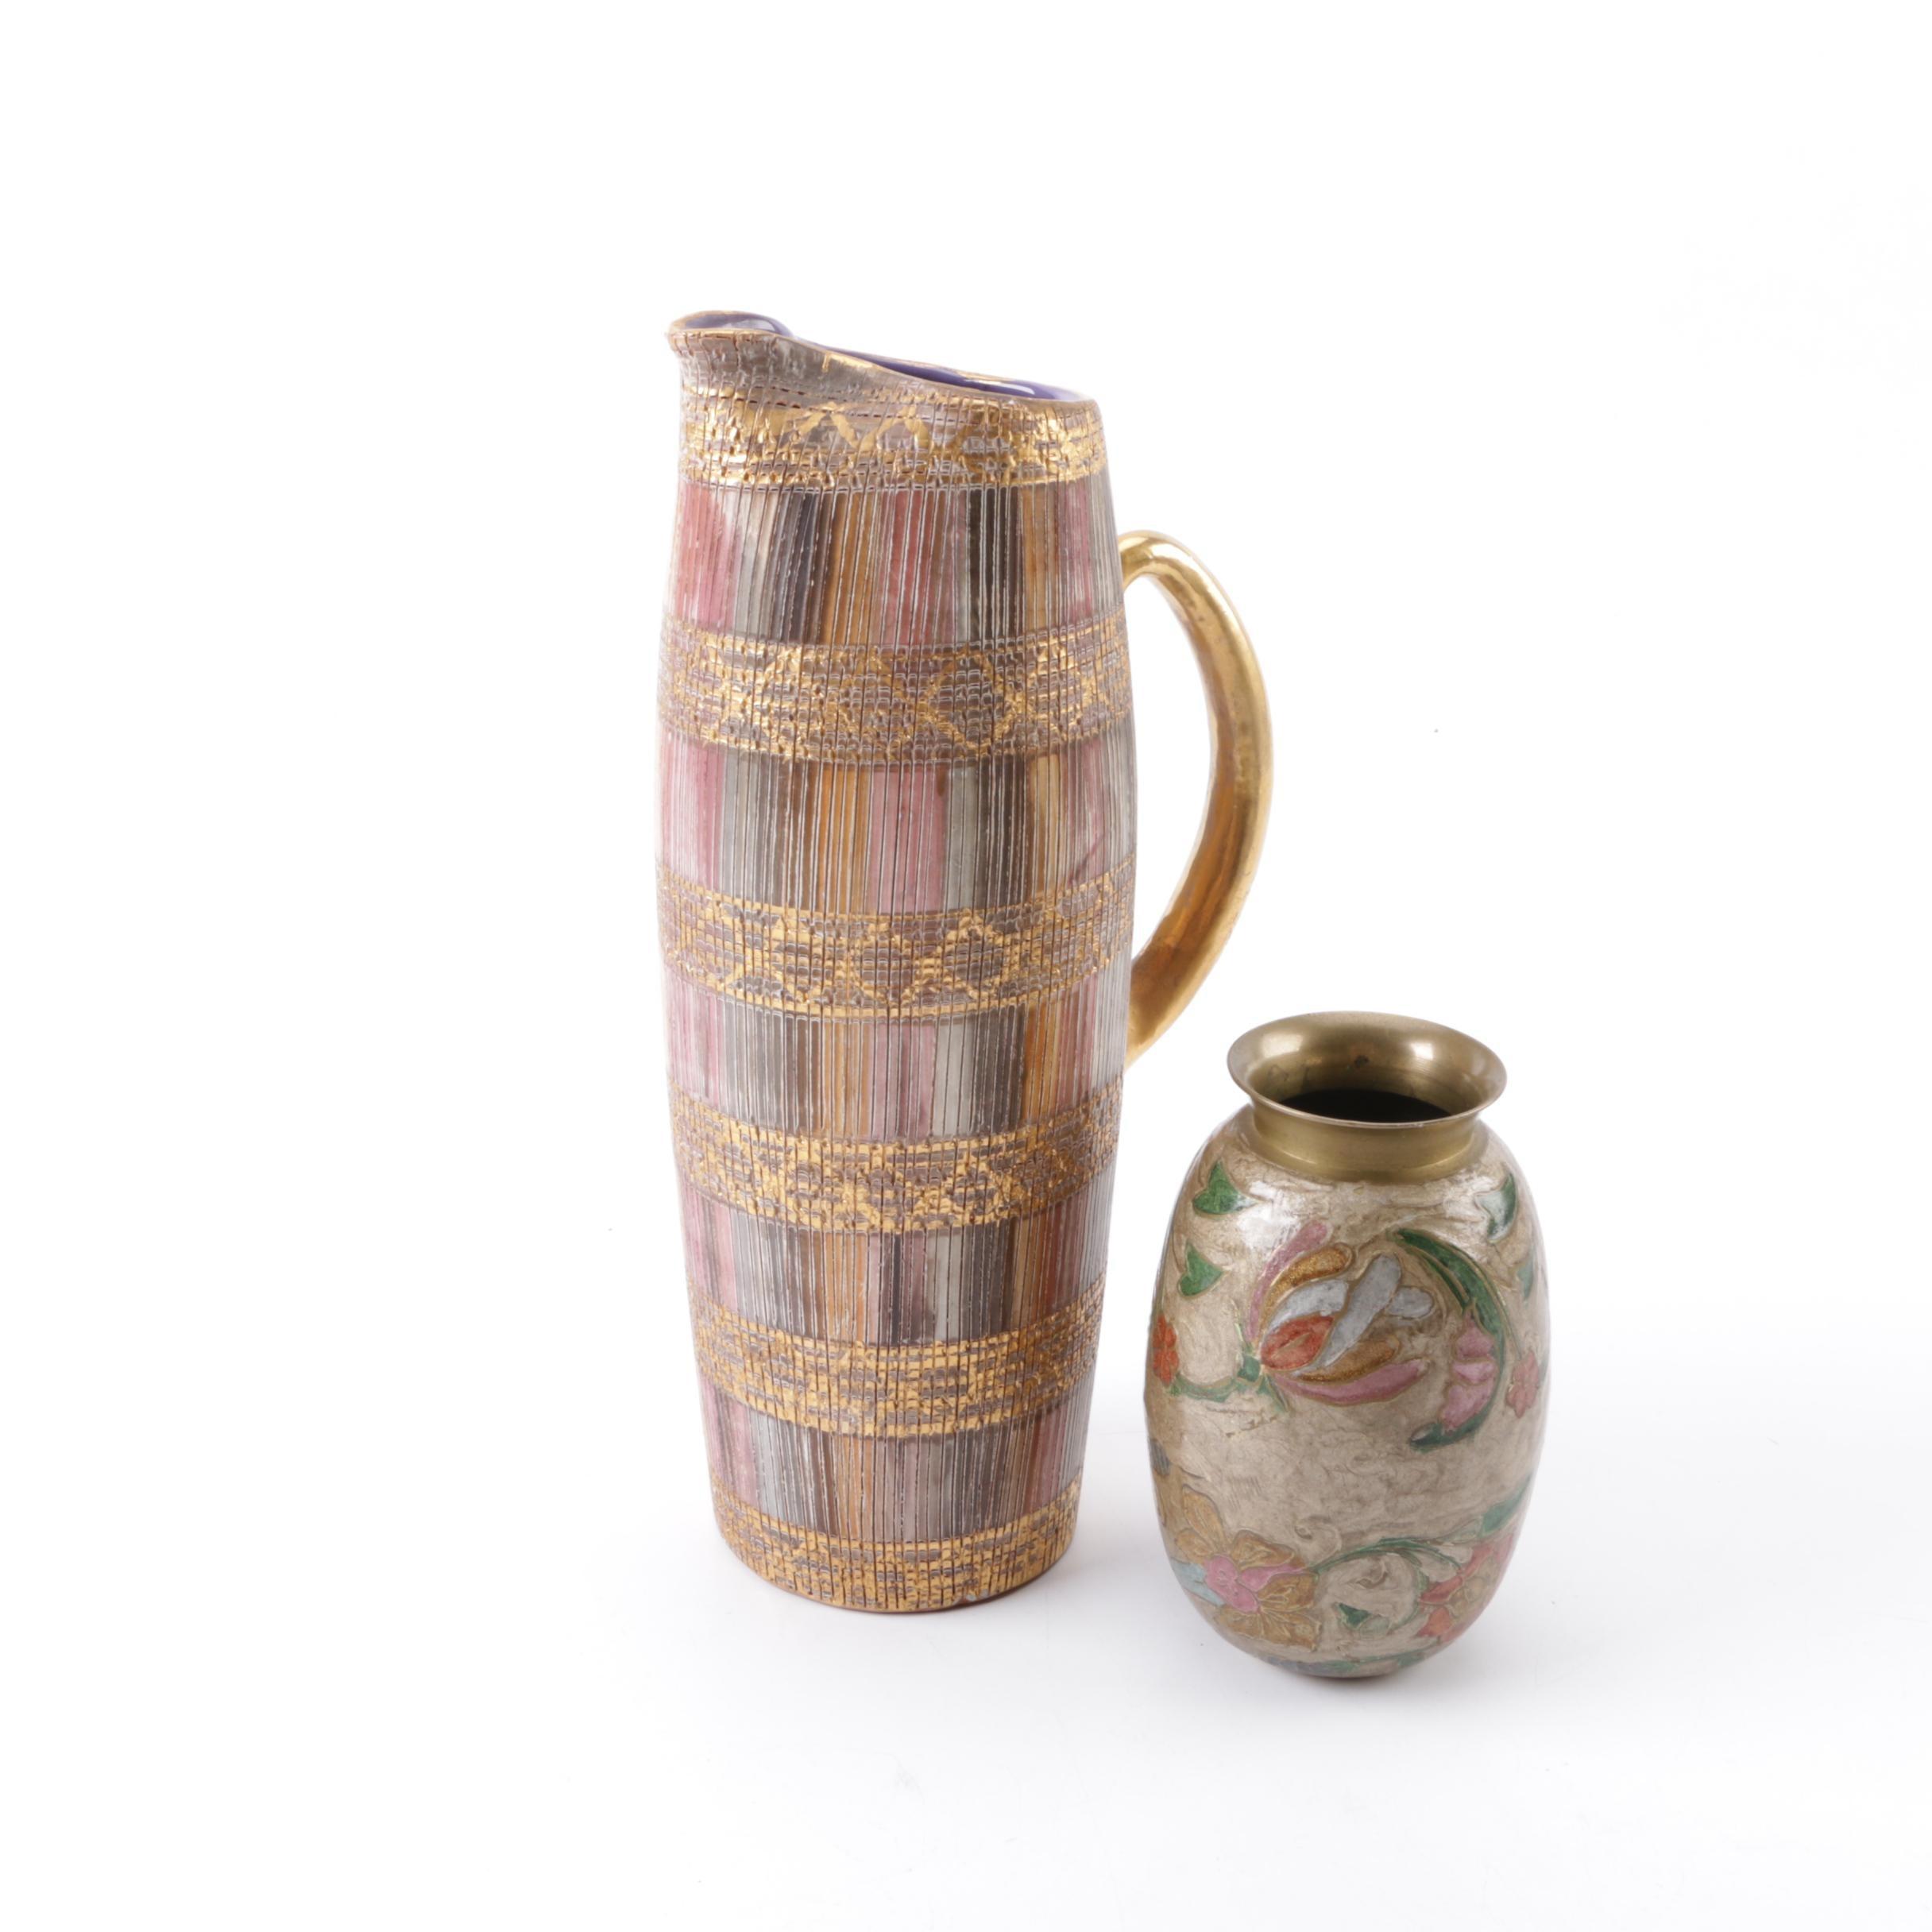 Italian Ceramic Pitcher and Brass Enameled Vase